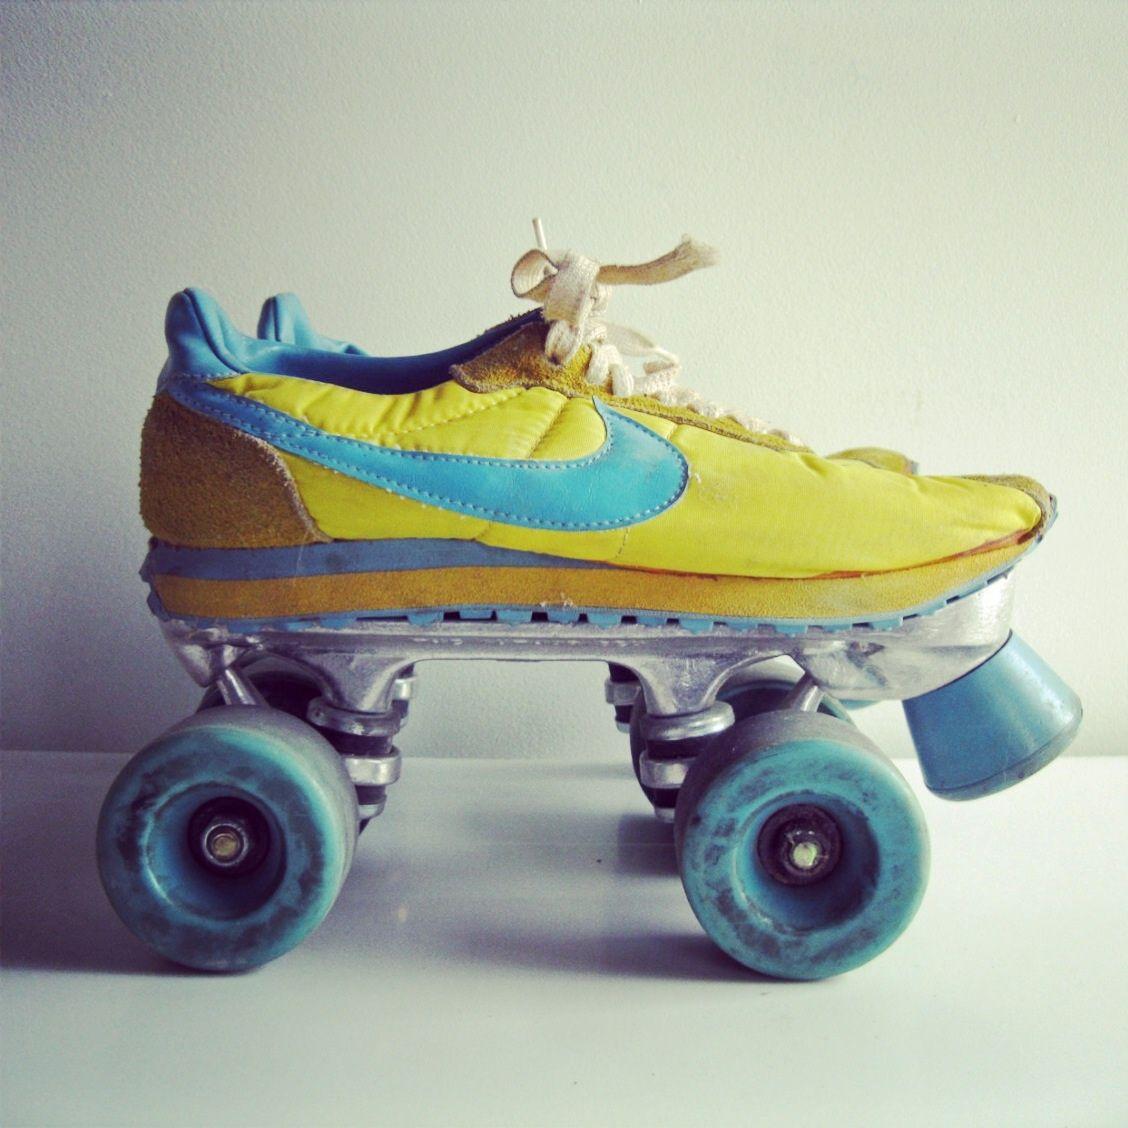 Vintage Nike Roller Skates Retro Vibe Sneakers Nike Roller Skates Roller Disco